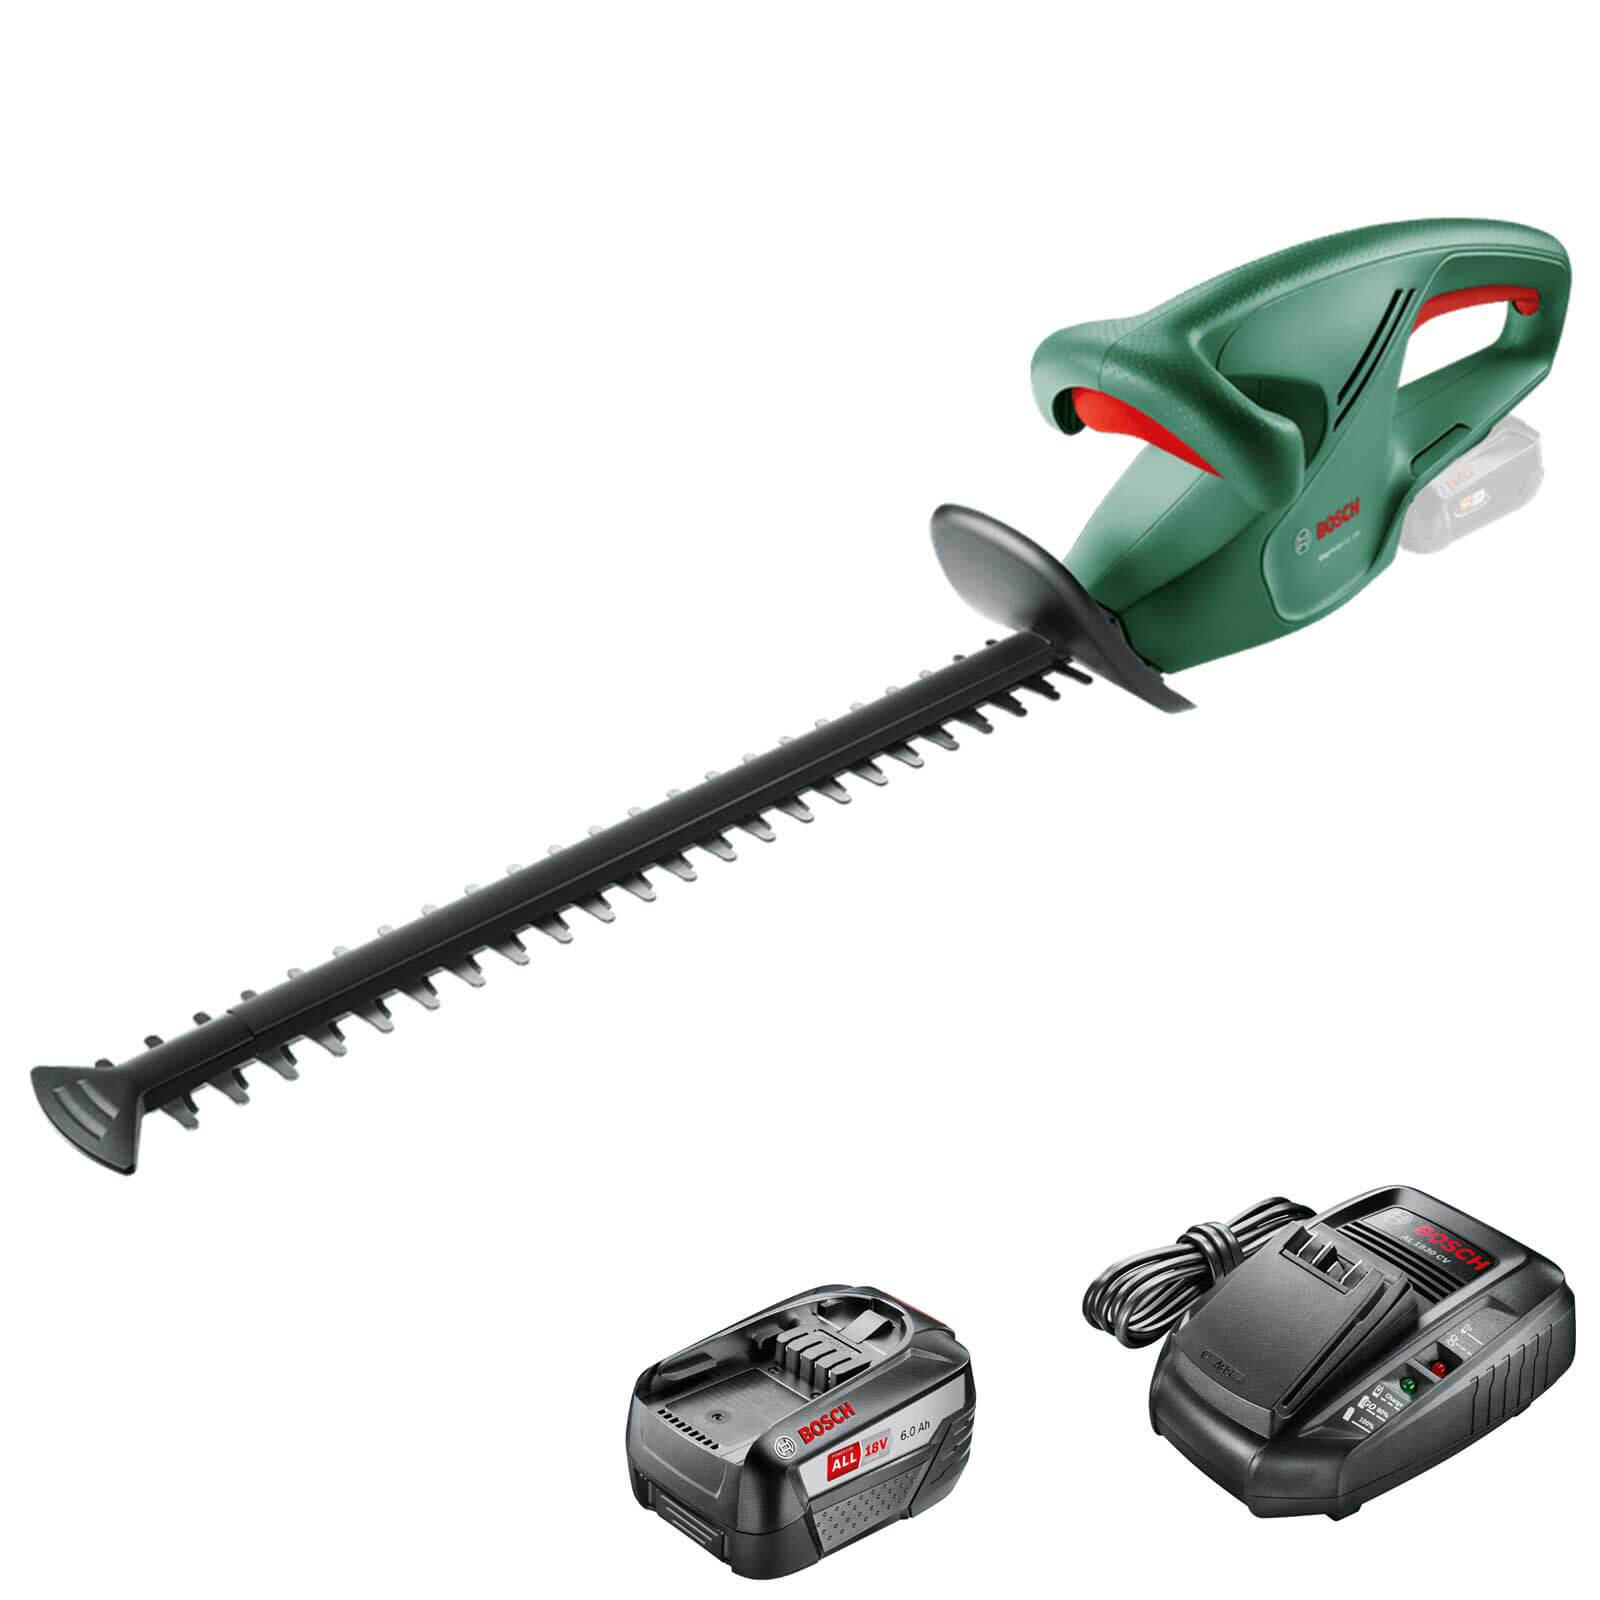 Bosch EASYHEDGECUT 18-45 18v Cordless Hedge Trimmer 450mm 1 x 6ah Li-ion Charger